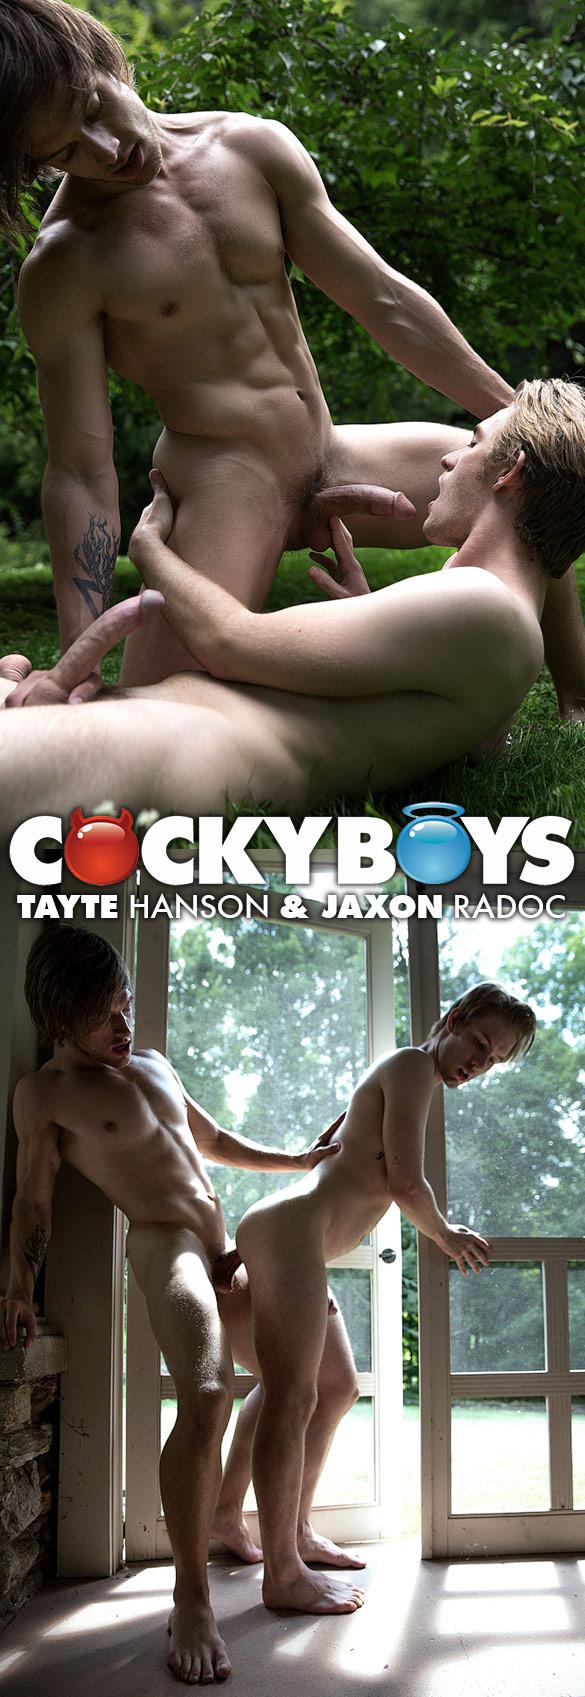 image Tayte hanson drills jaxon radoc scene 1